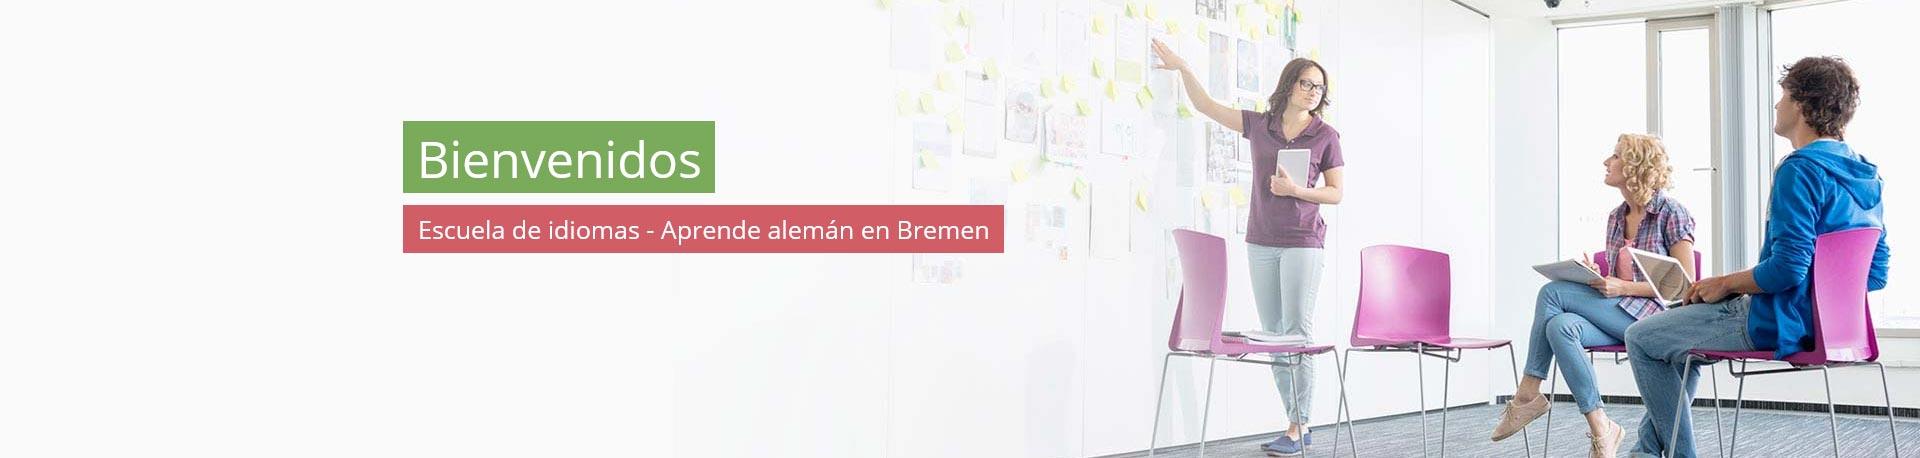 Aprender alemán en Bremen